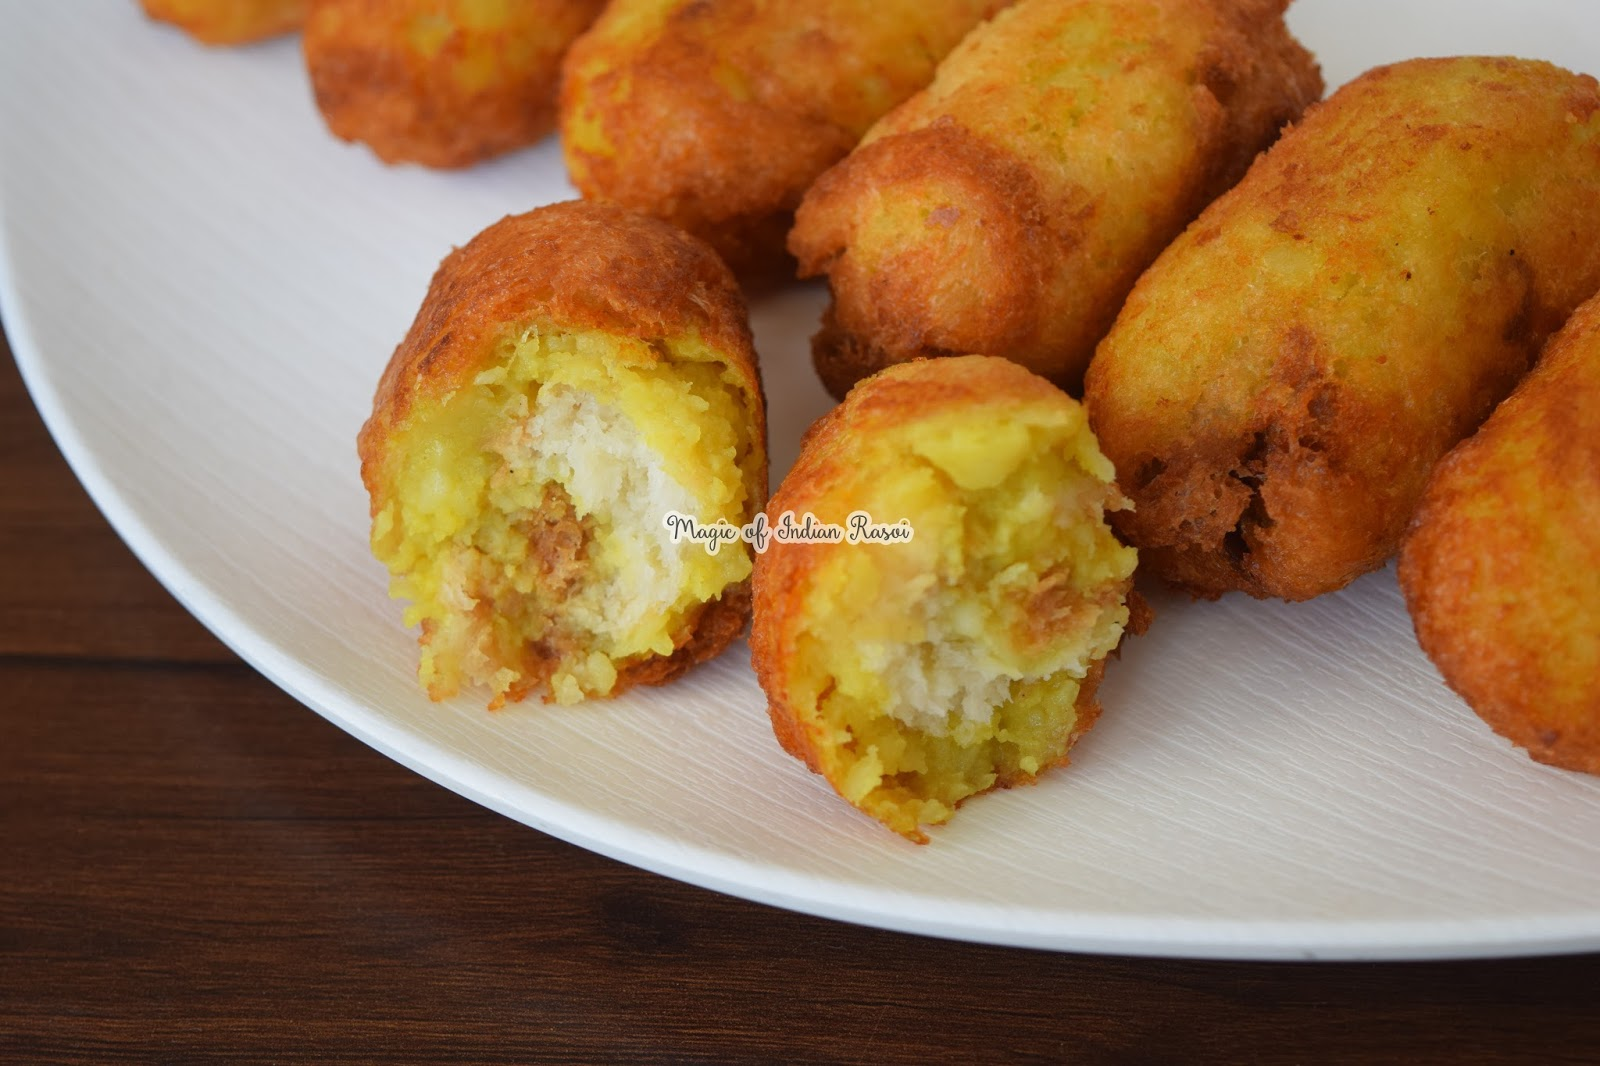 Bread Rolls Recipe - Gujarat College Canteen Famous Snack - ब्रेड रोल्स रेसिपी - गुजरात कॉलेज कैंटीन का प्रसिद्ध नाश्ता - Priya R - Magic of Indian Rasoi